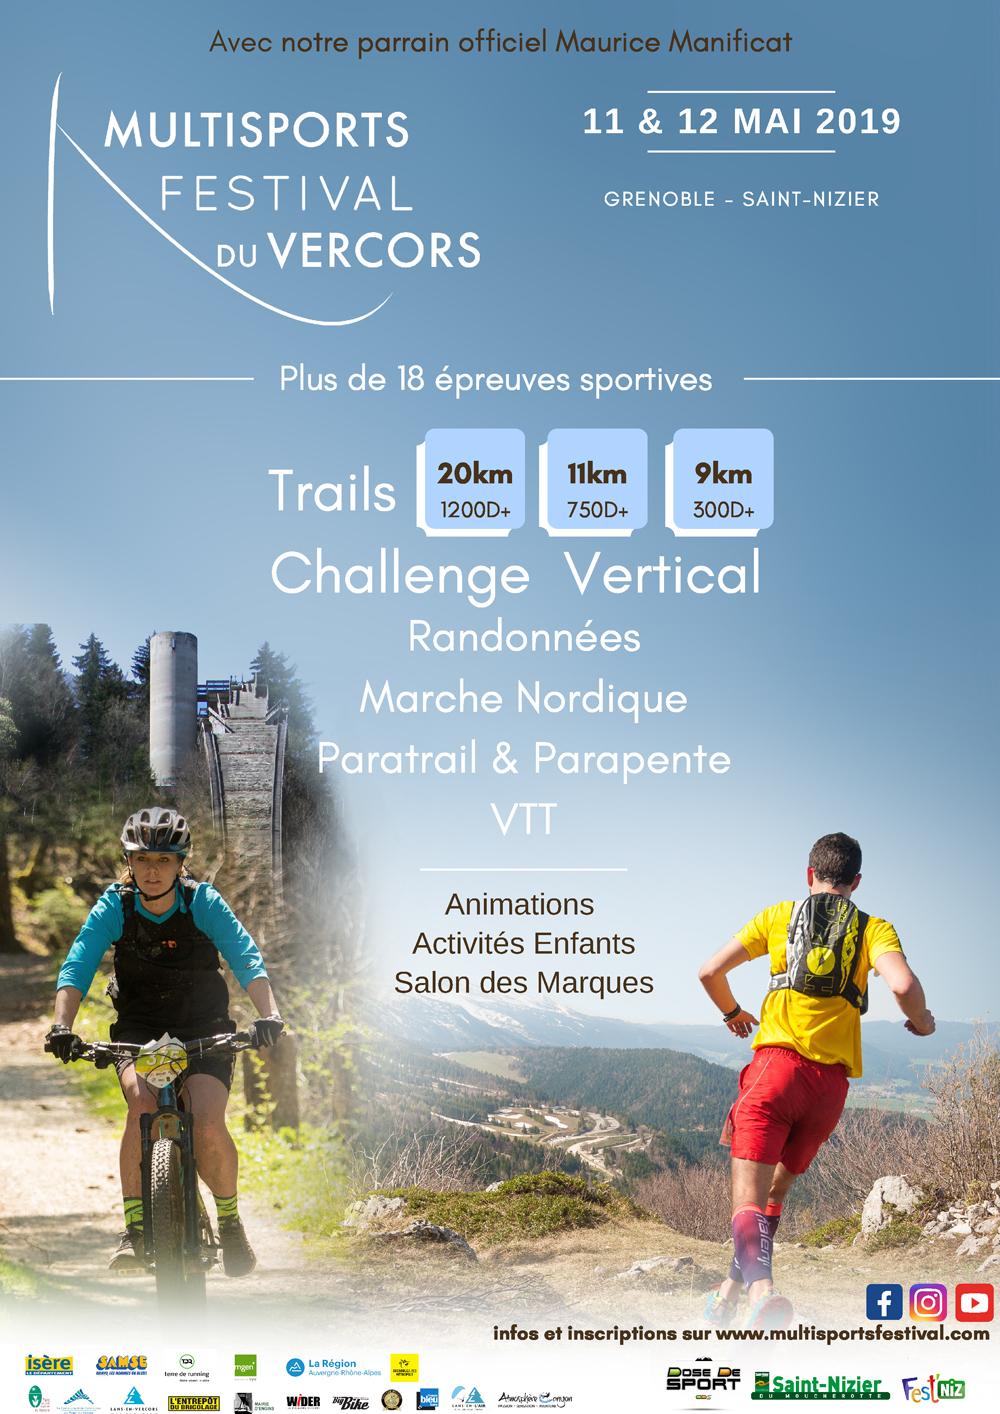 Multisports festival du Vercors